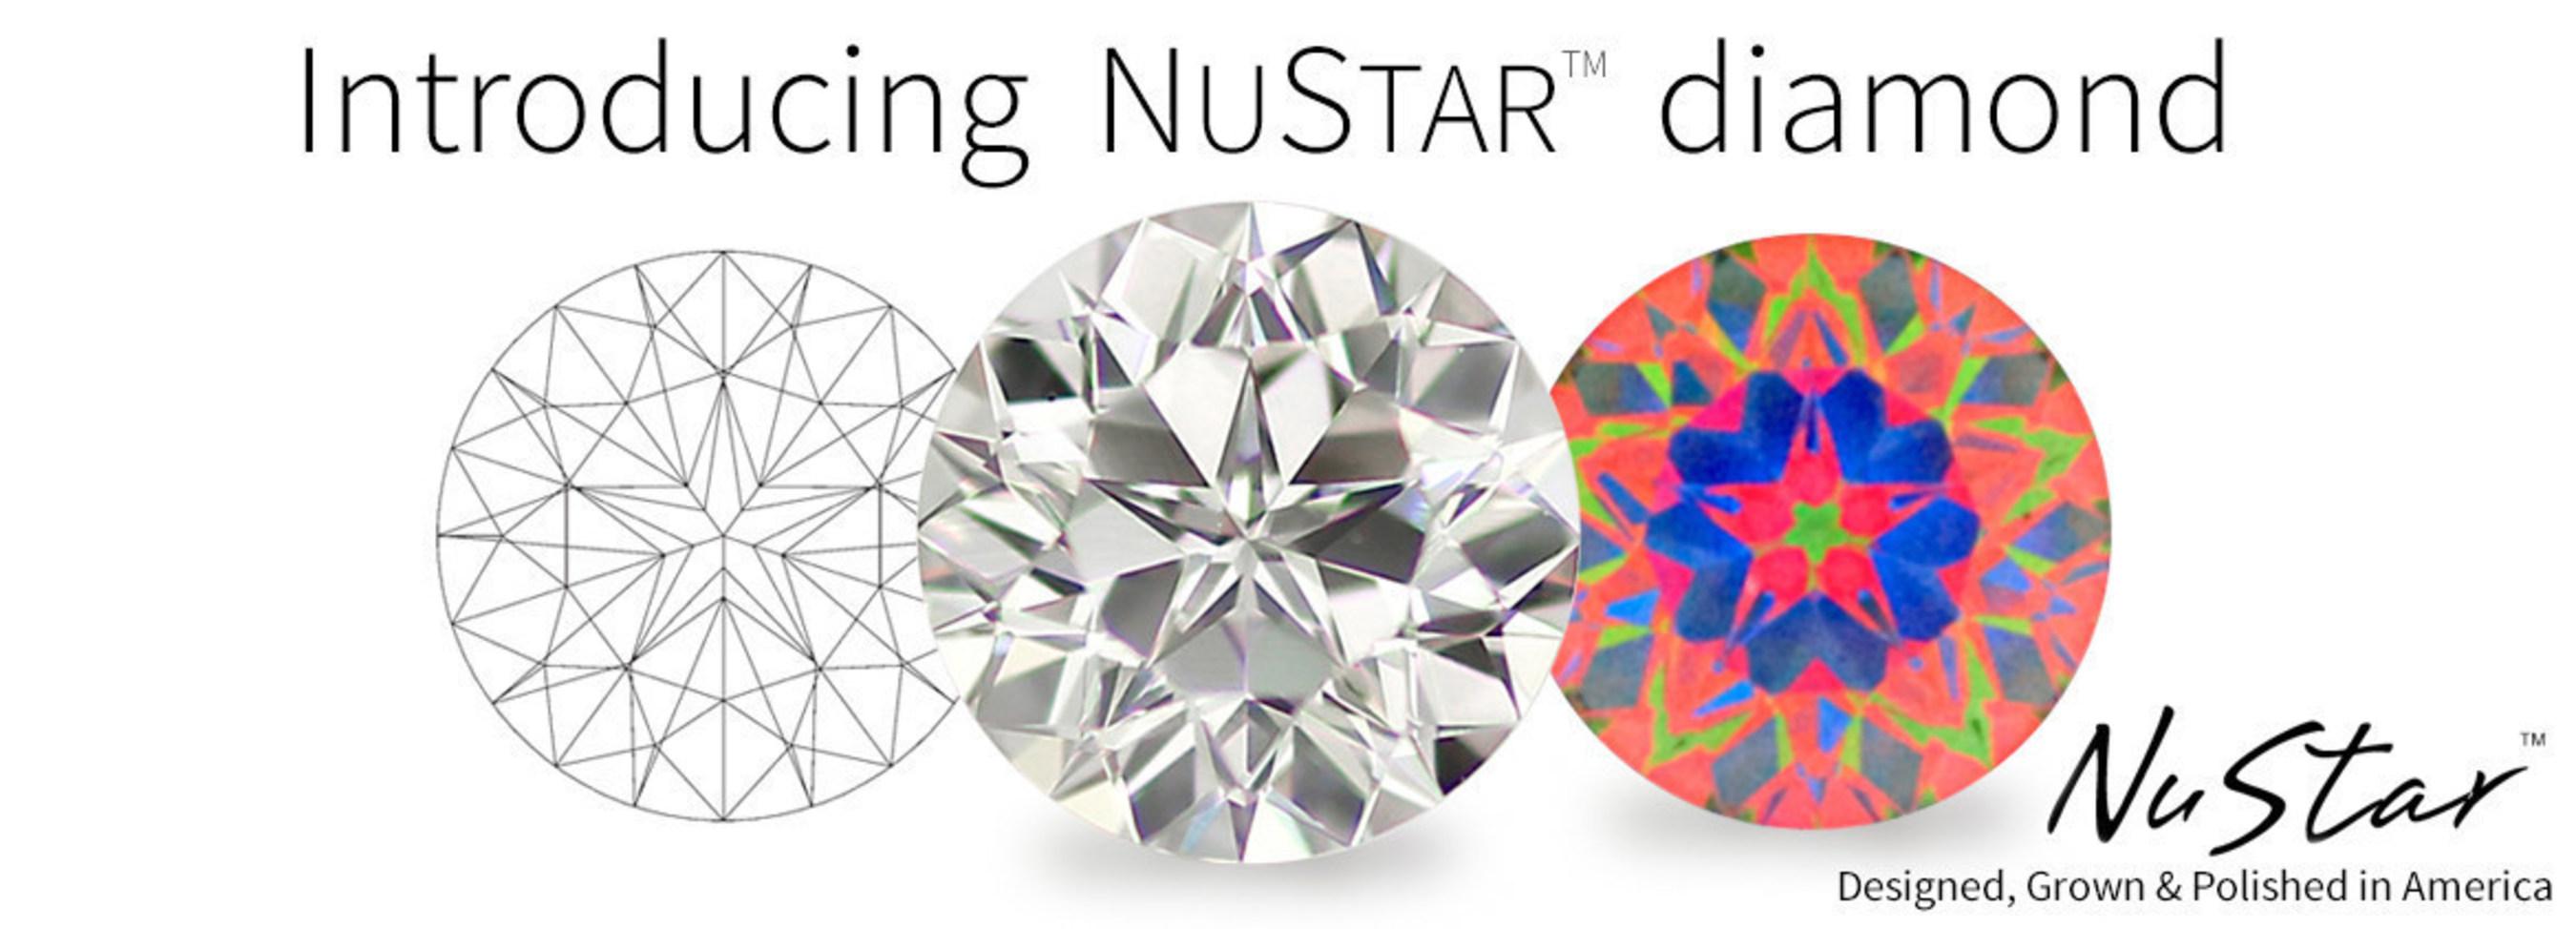 NUMINED® Creates Revolutionary New Diamond Cut